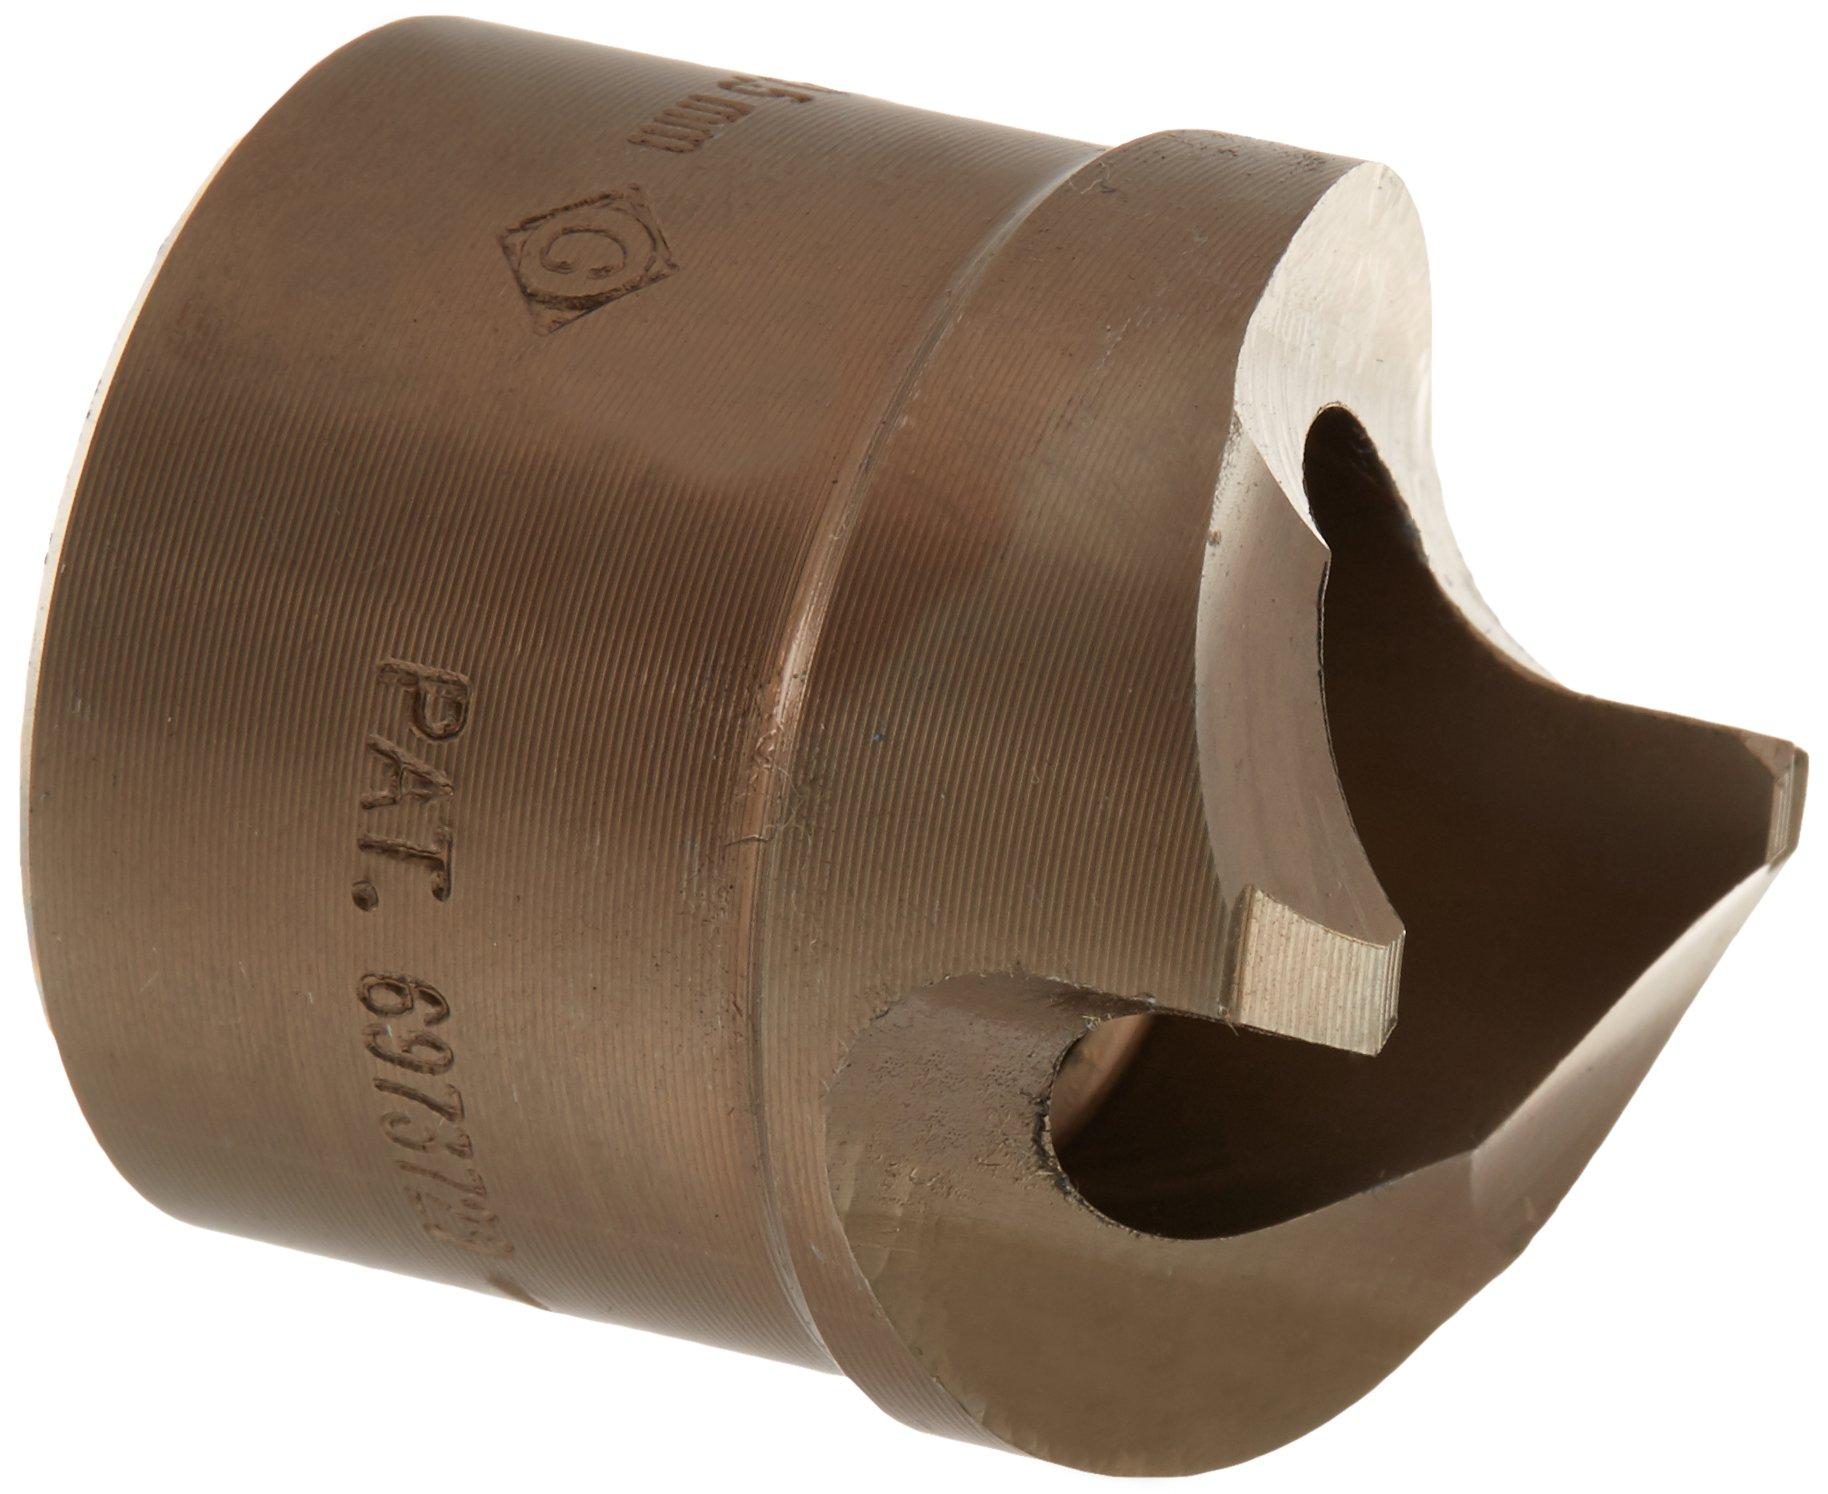 Greenlee 36490 Slug-Splitter Self-Centering Knockout Punch, 1-7/32-Inch